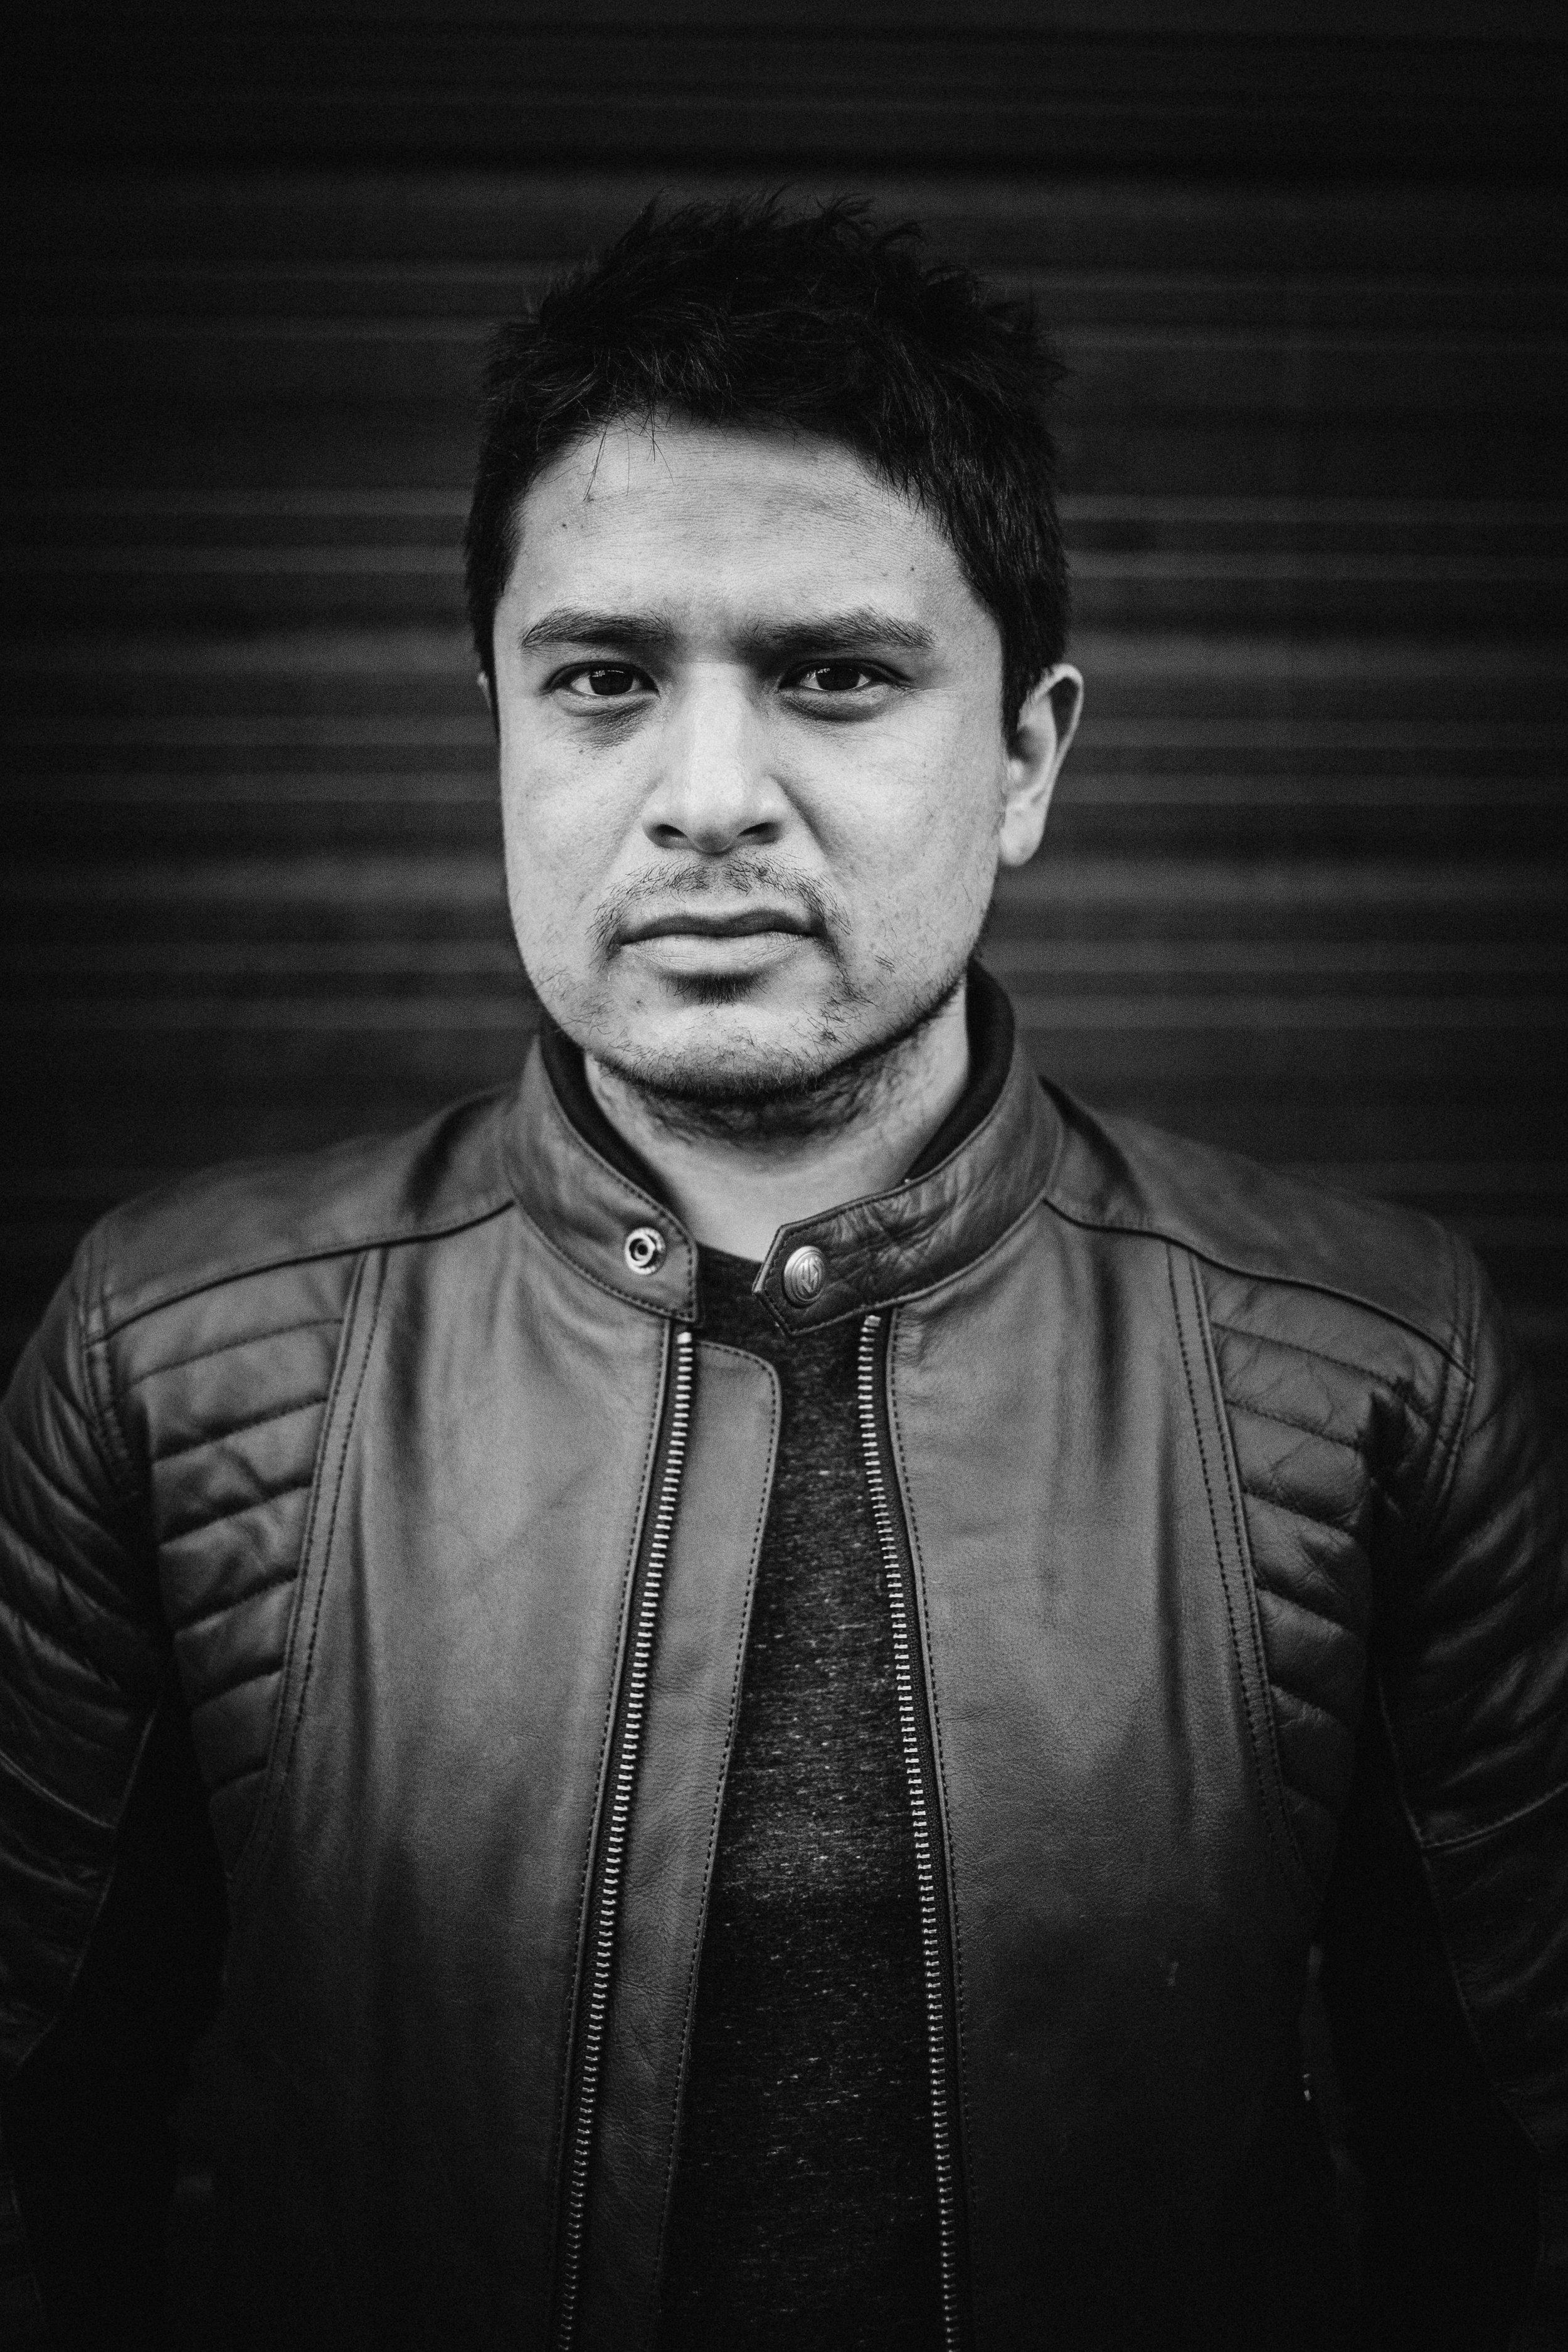 Juan Hernandez | #TheMotoSocialCHICAGO